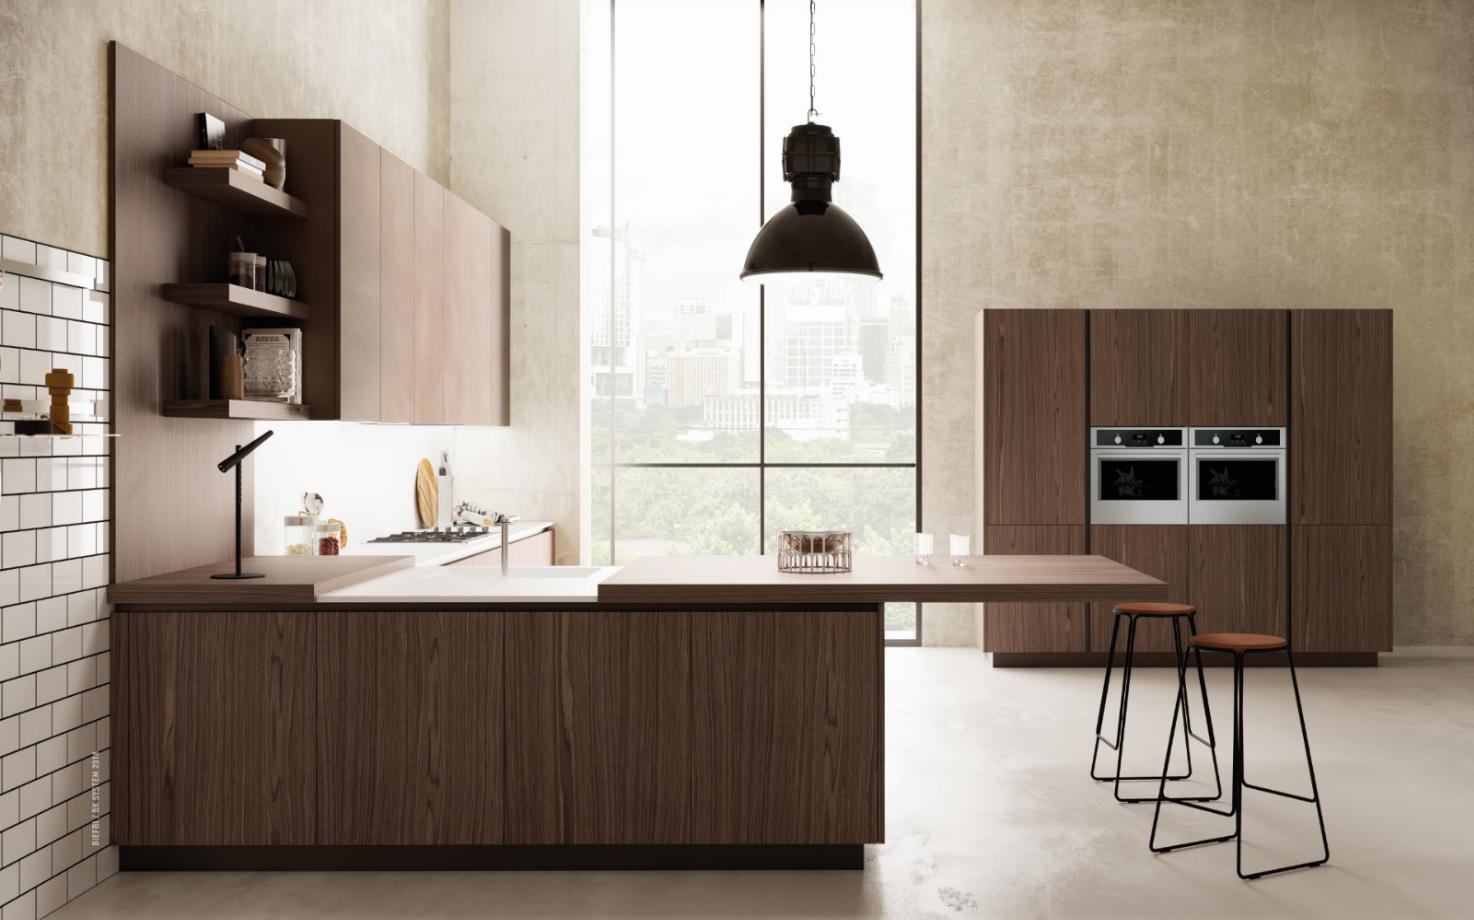 Breakfast Top Slide Out Breakfast Bar Counter Top Kitchen Construction Kitchen Countertops Modern Kitchen Design